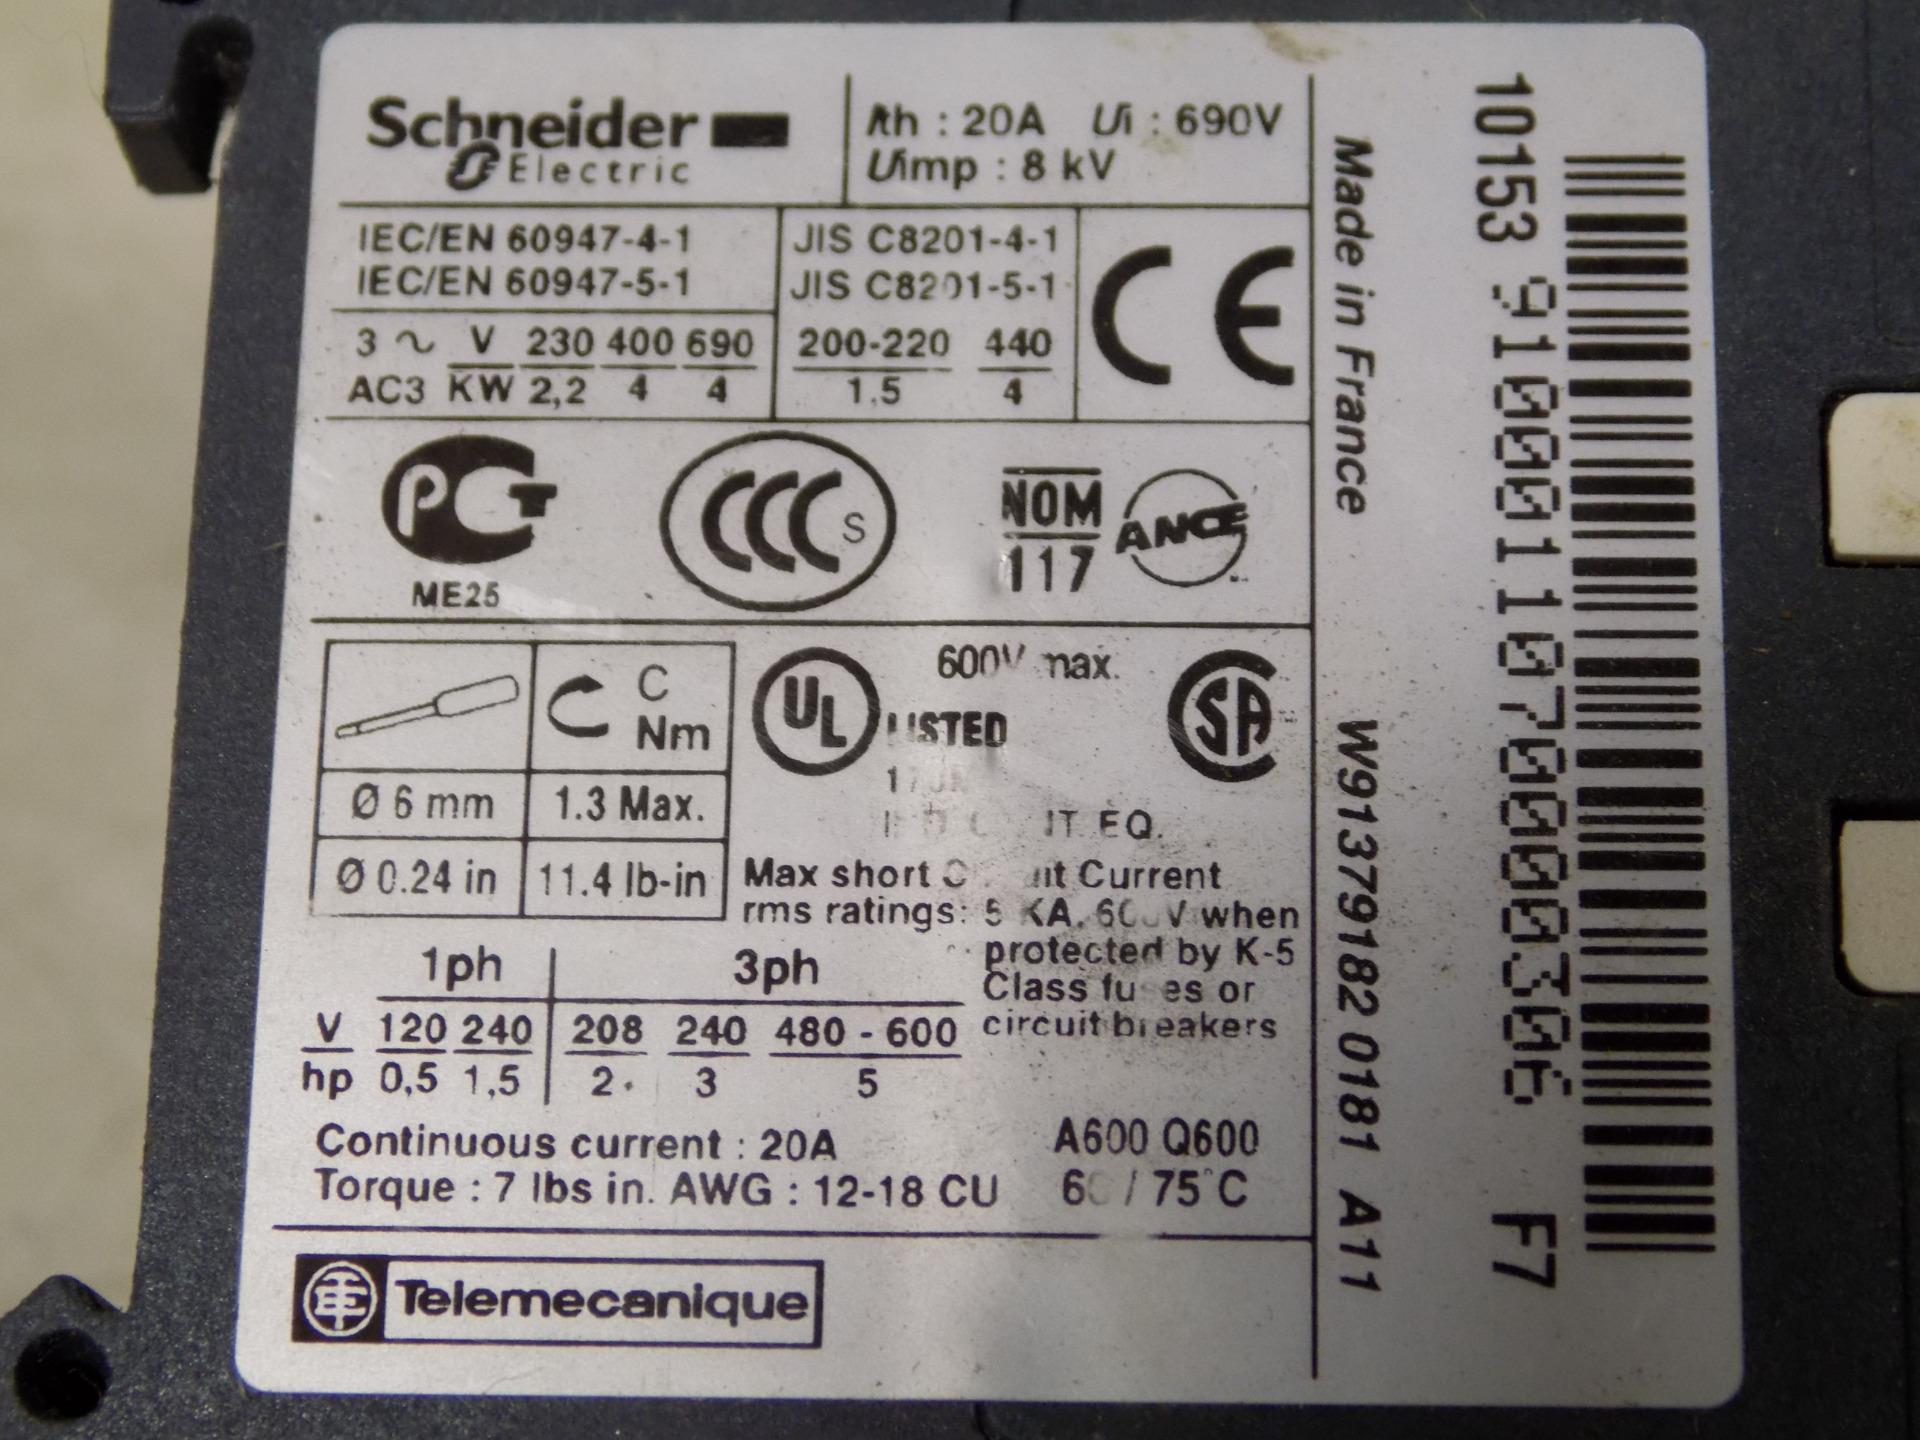 SCHNEIDER ELECTRIC 110V CONTACTOR LC1K09 | eBay